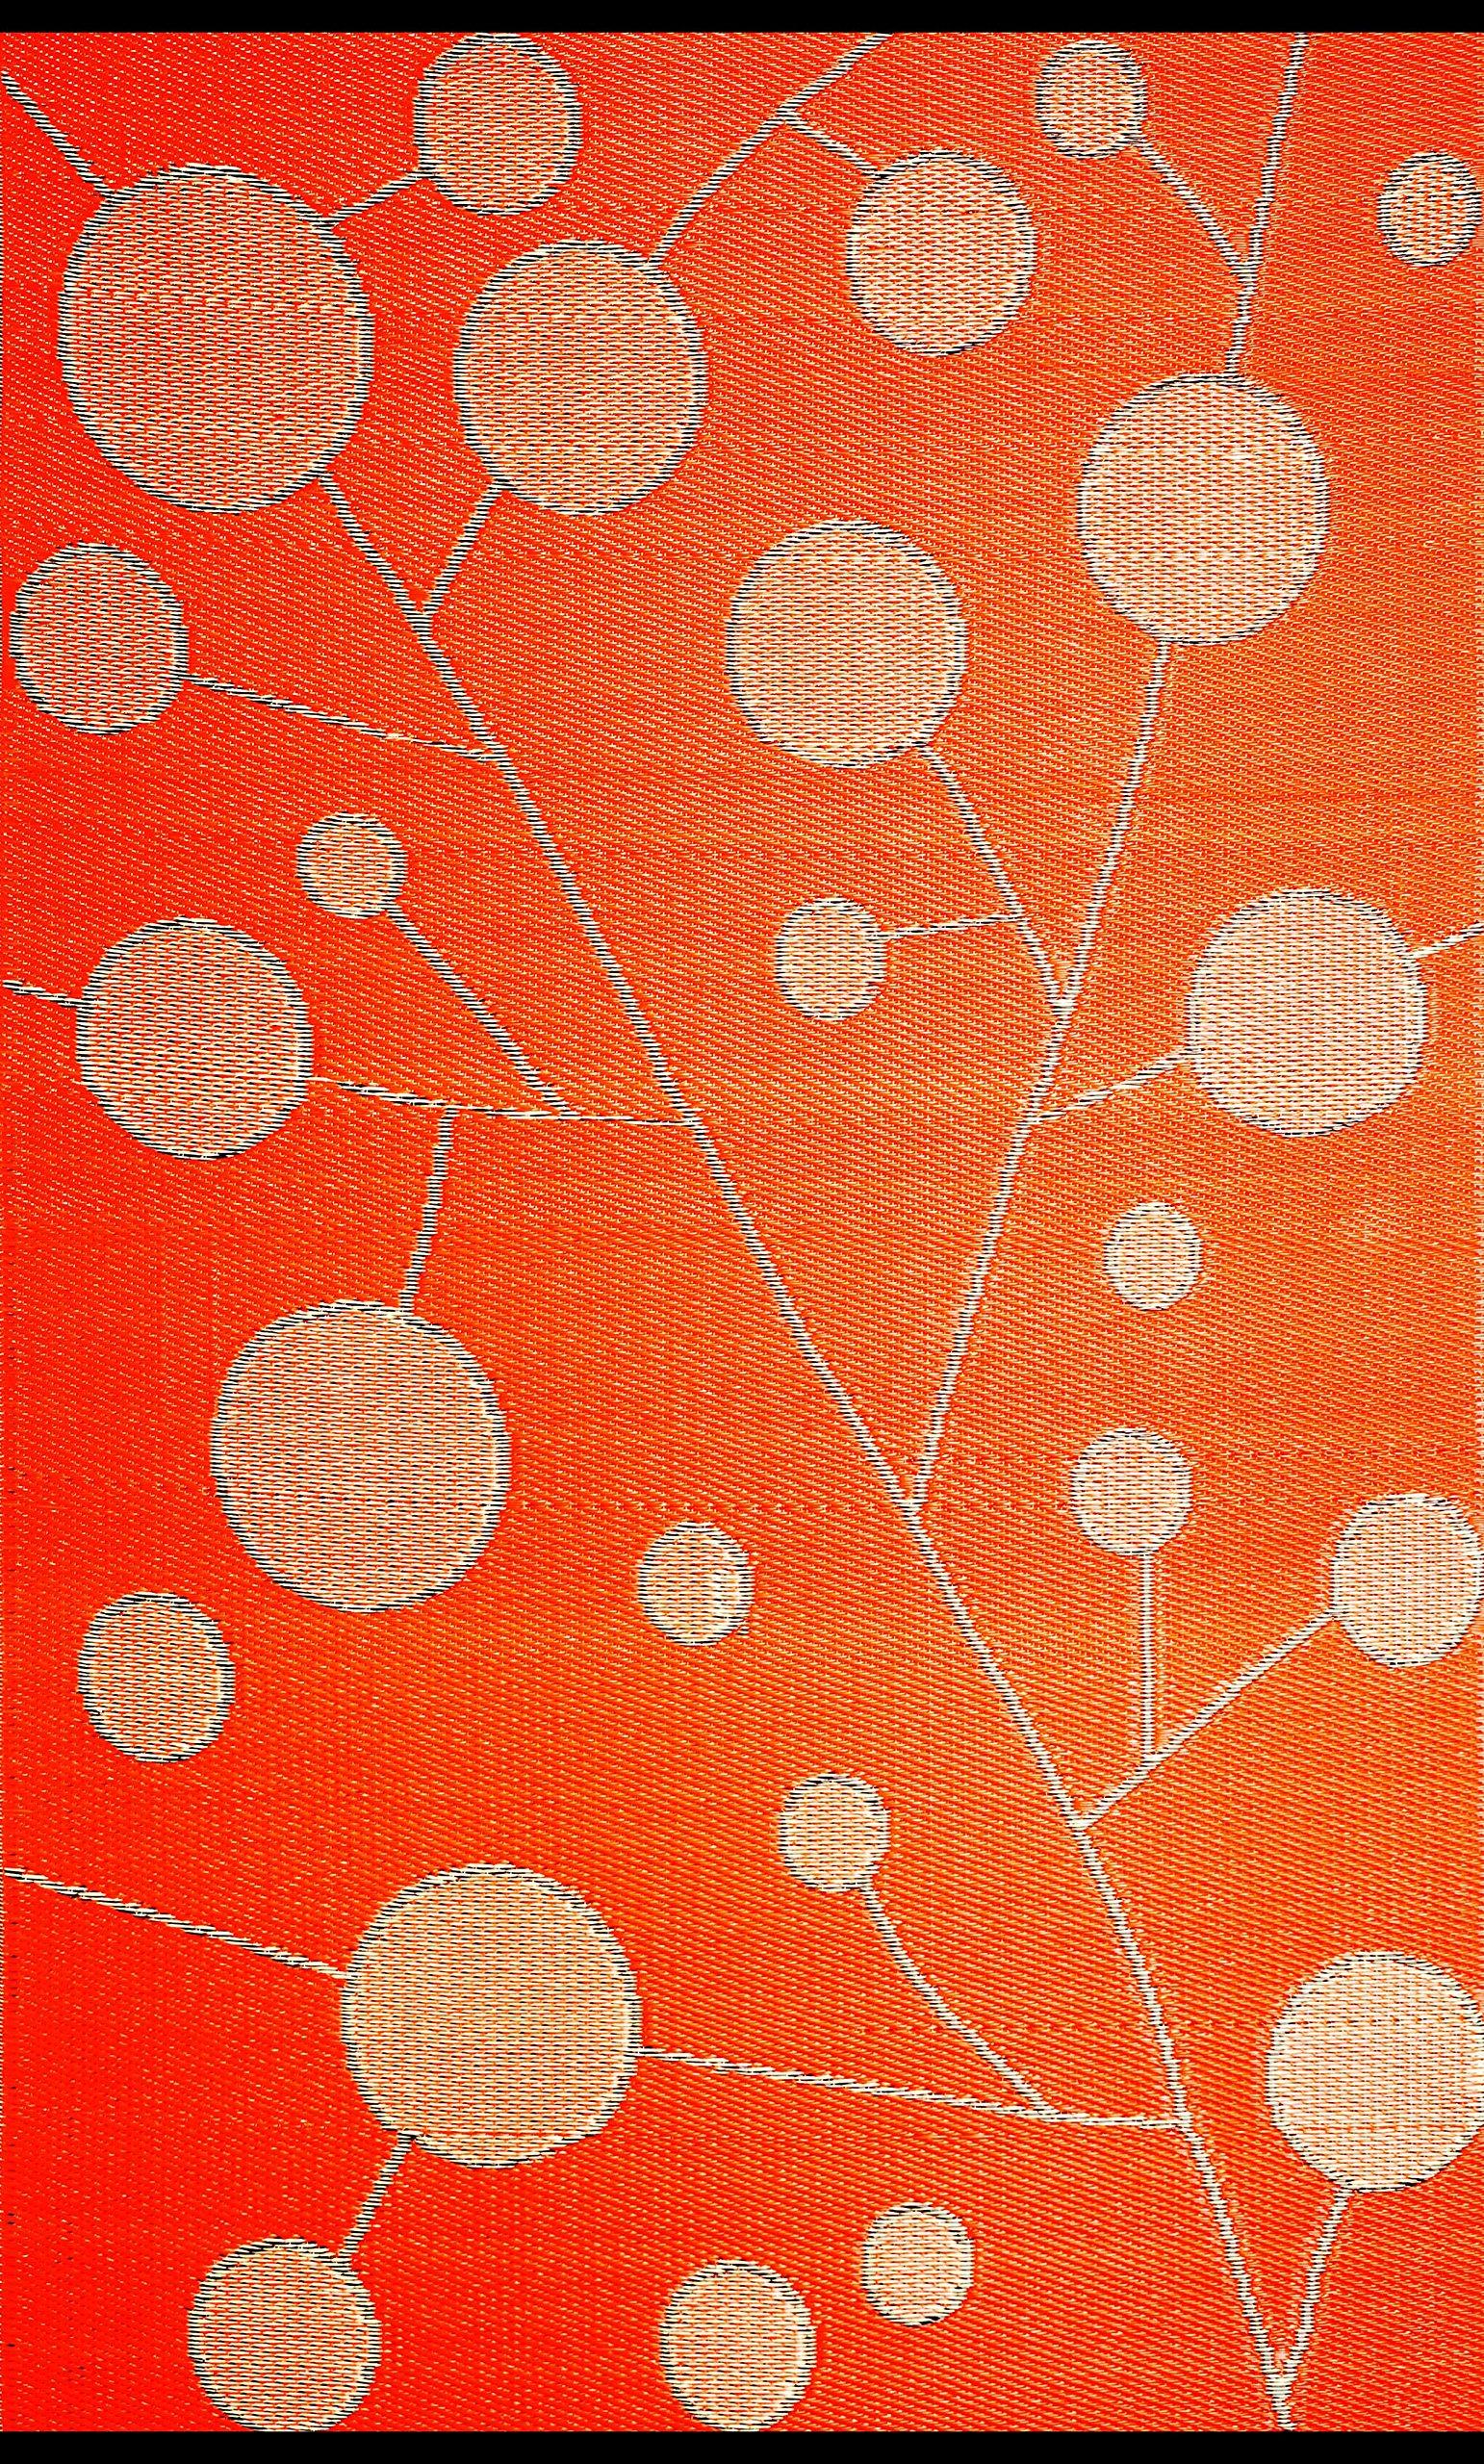 b.b.begonia Contemporary Reversible Design Cotton Ball Outdoor Area Rug, 6' x 9', Brown/Orange by b.b.begonia (Image #2)